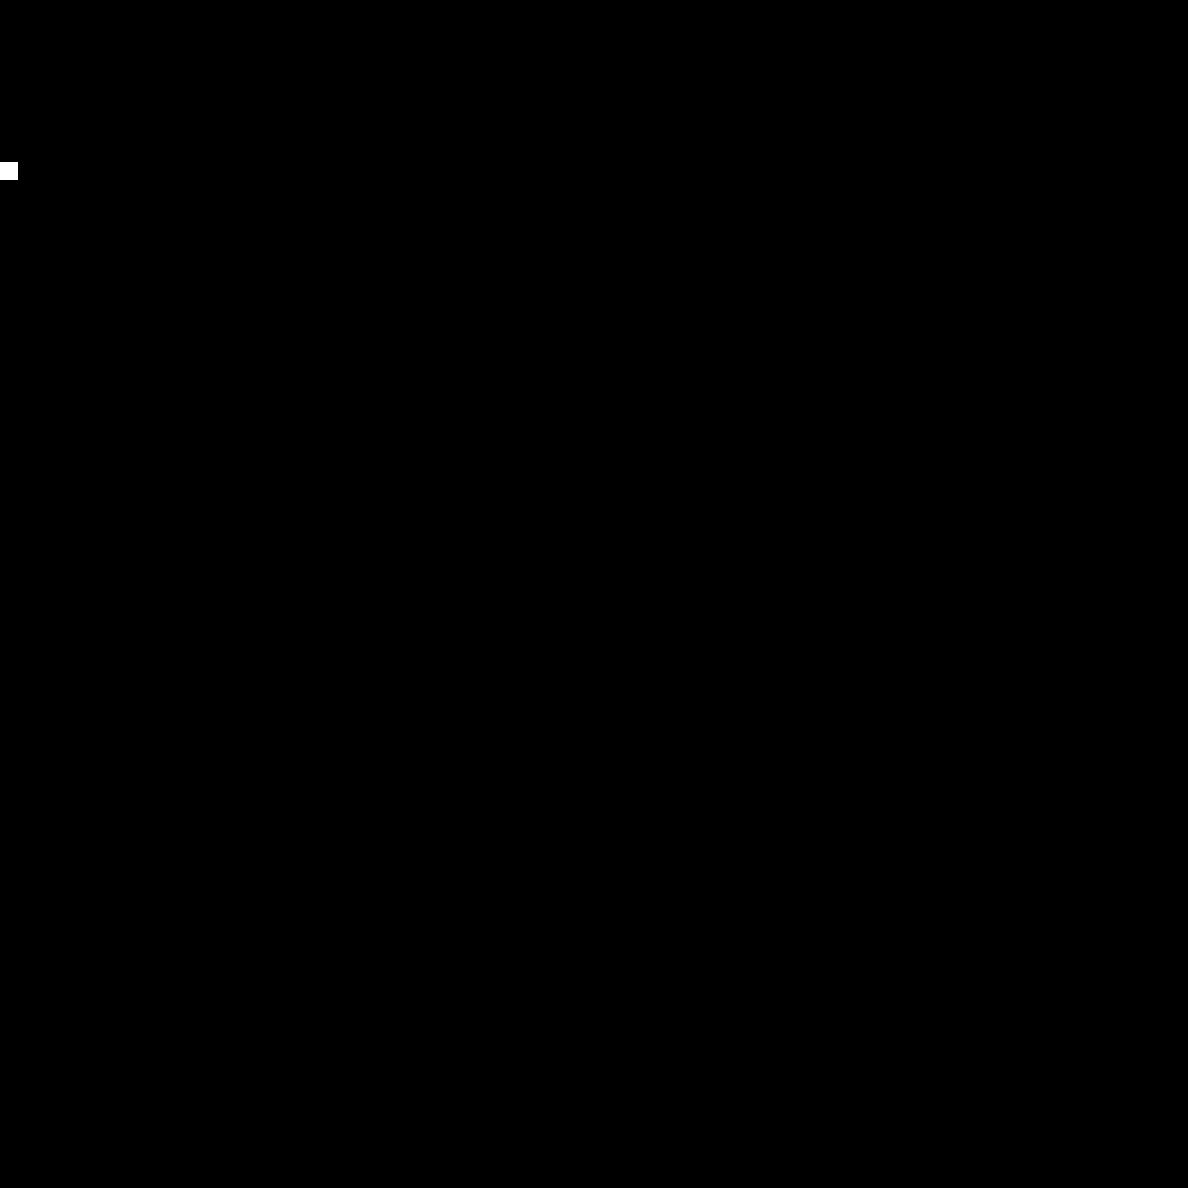 Black and White Circle Font by Kraken15